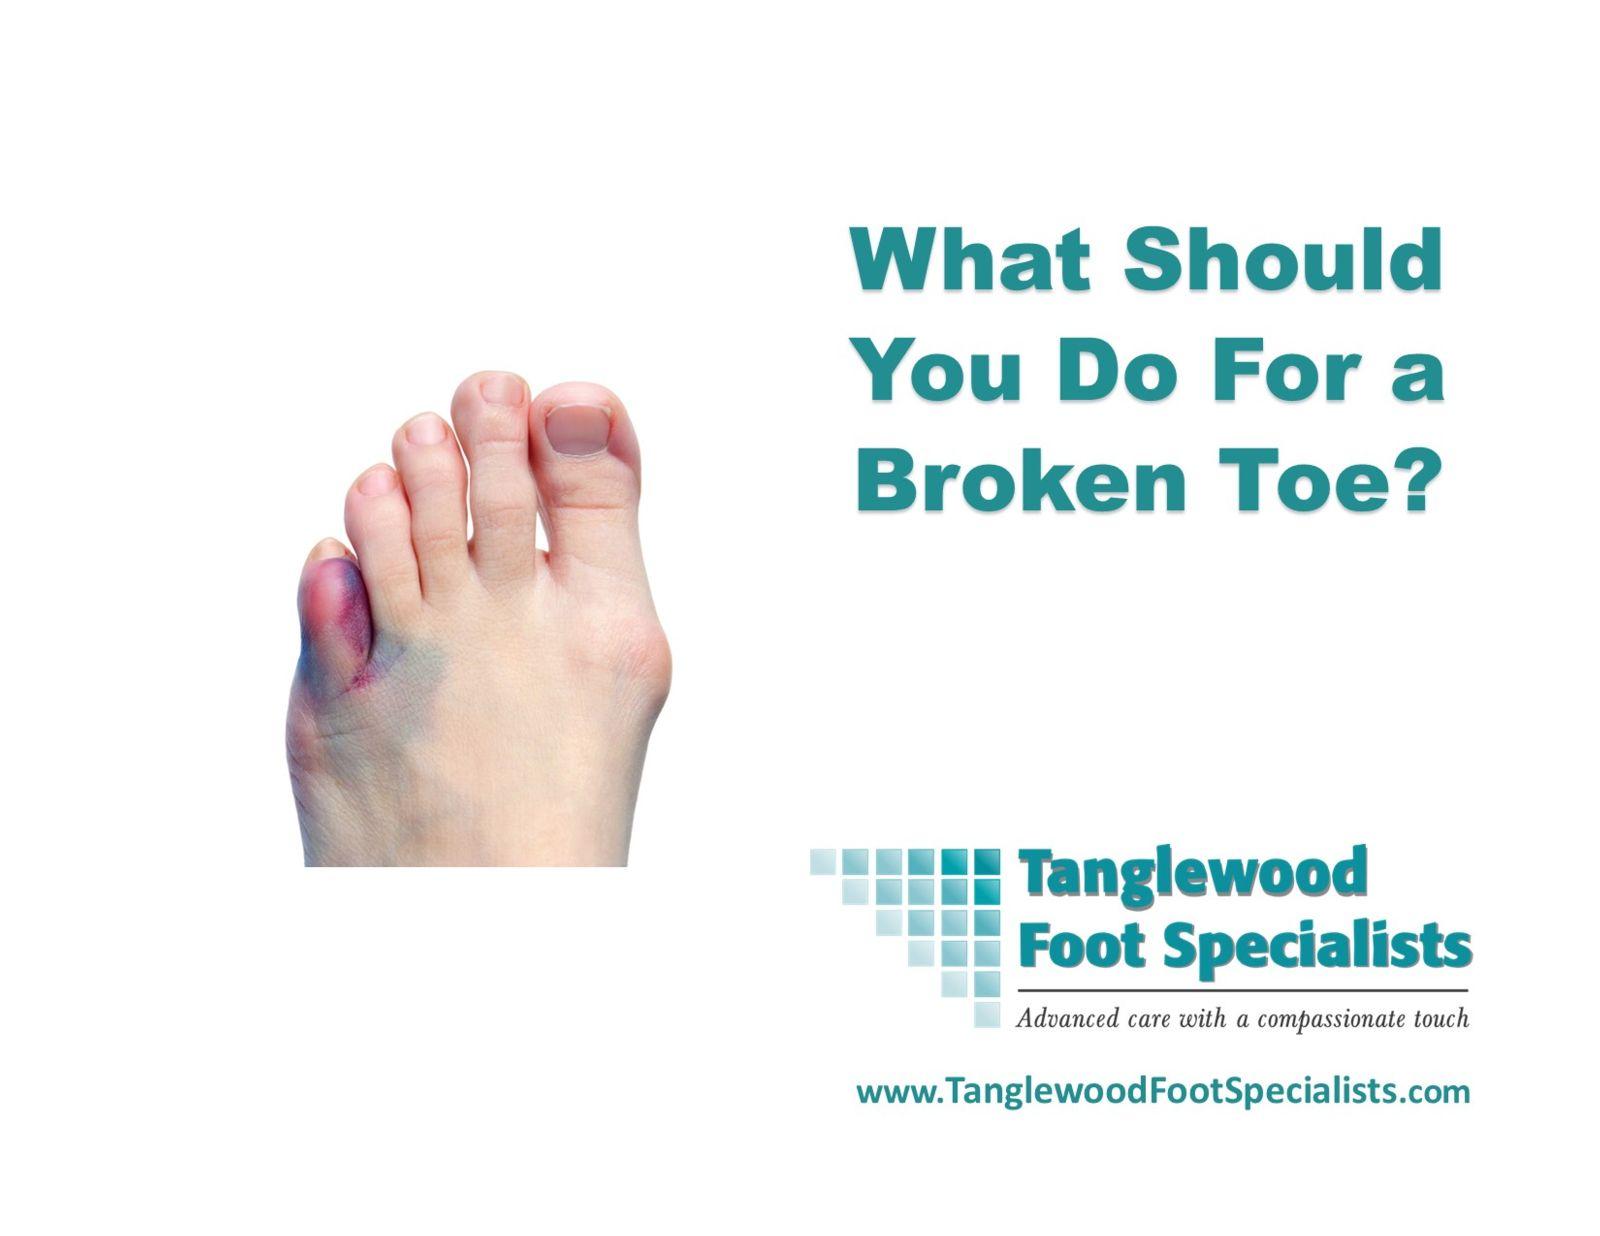 What do you do for a broken toe?